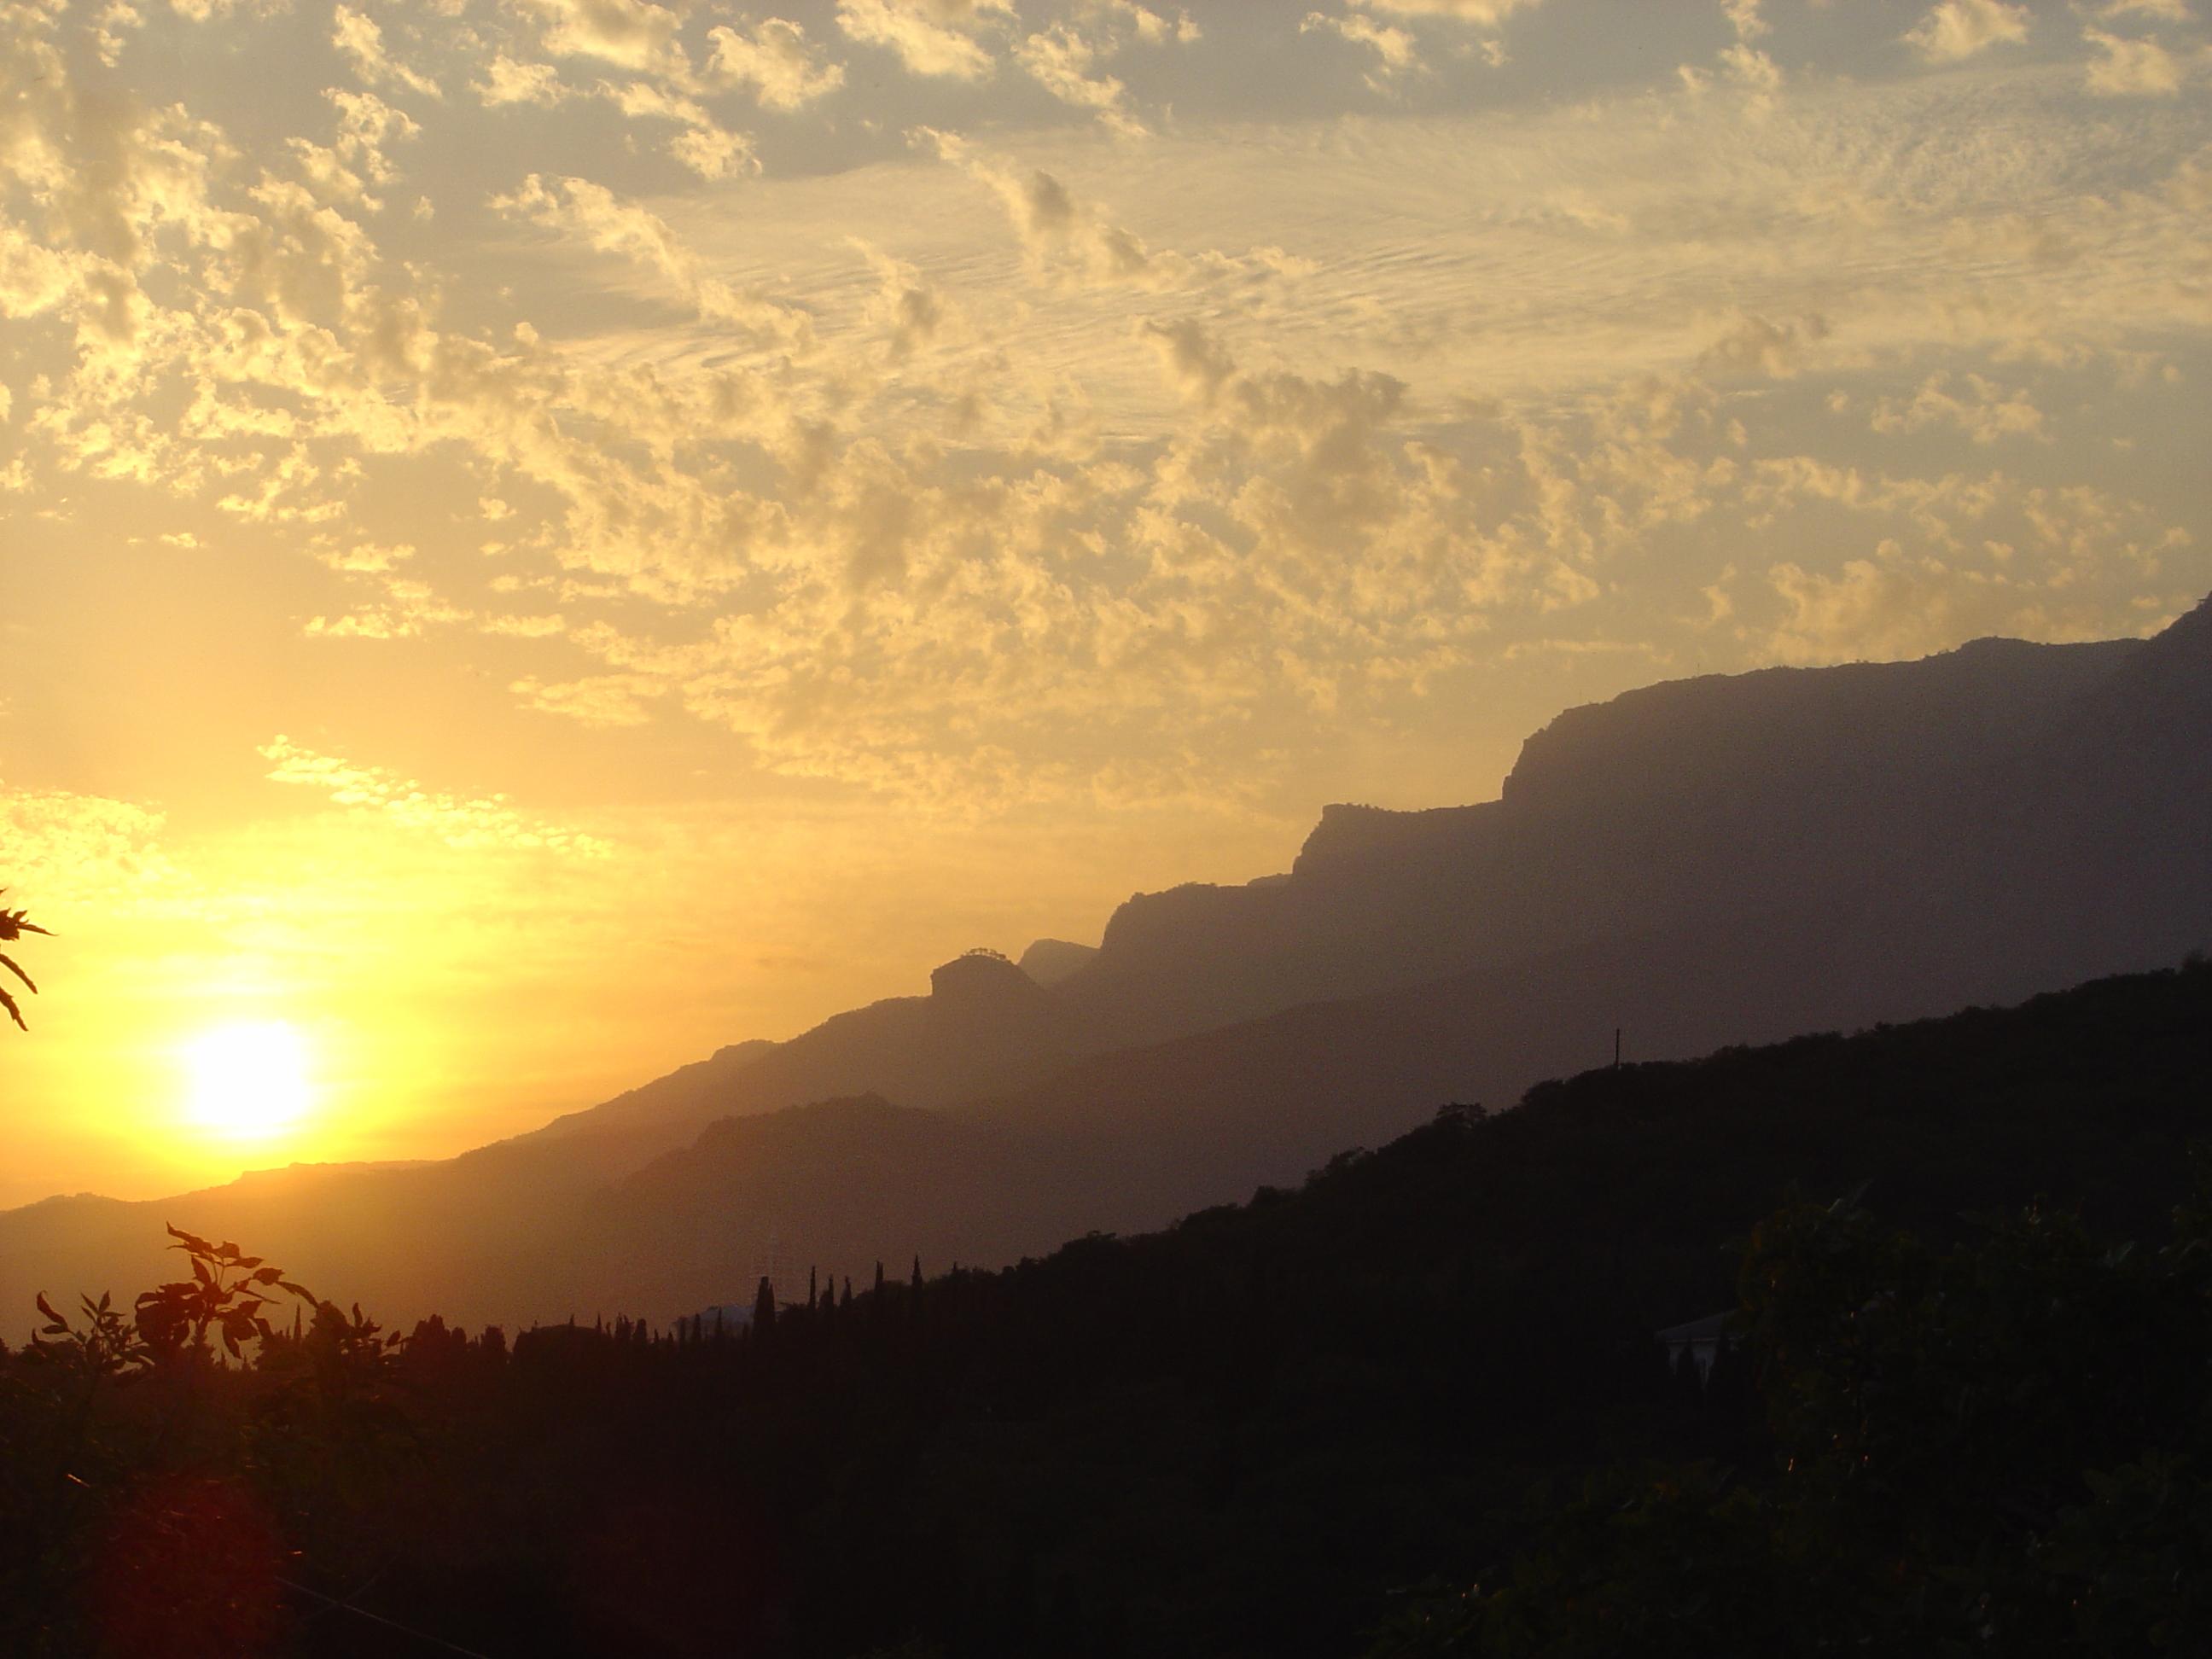 Krim - 9 - Sunset